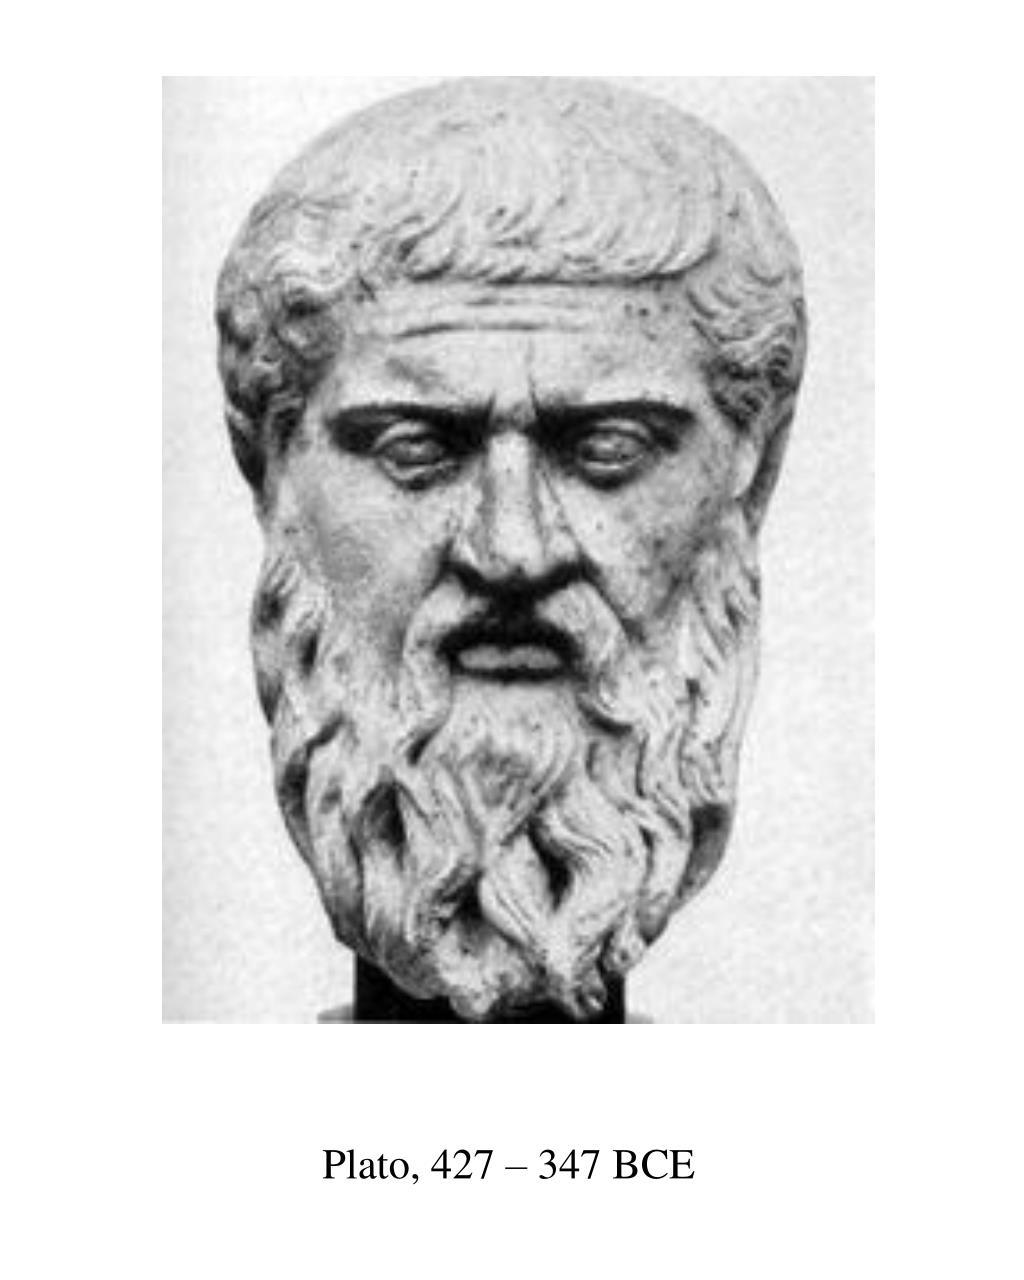 Plato, 427 – 347 BCE